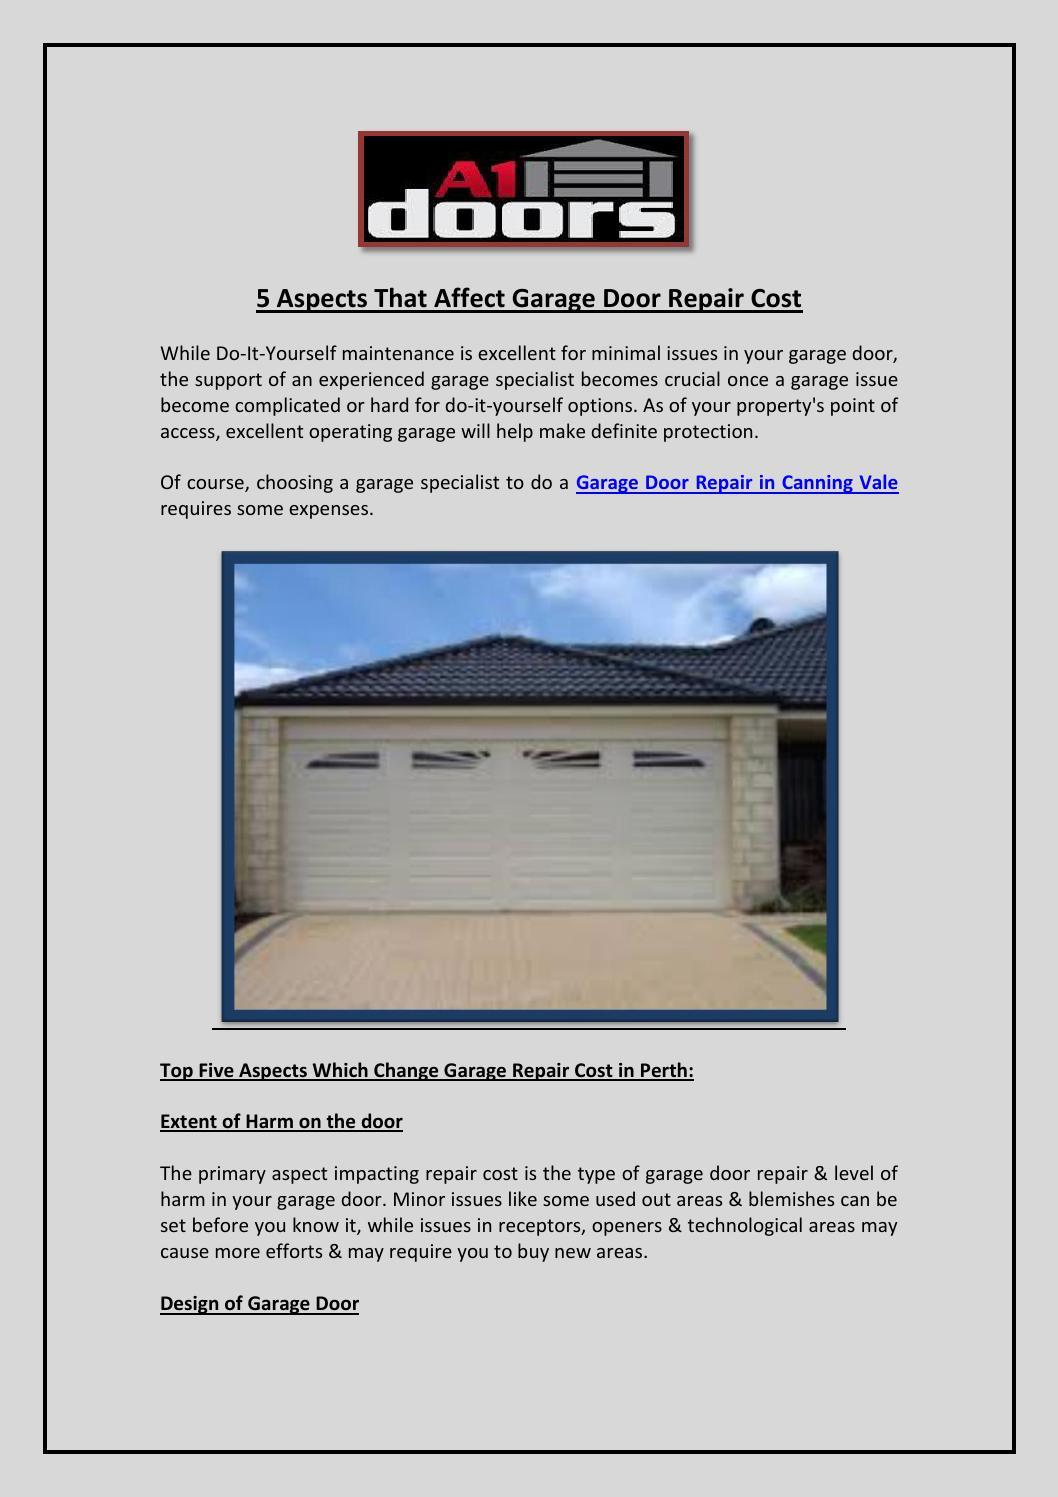 5 Aspects That Affect Garage Door Repair Cost By A1 Doors